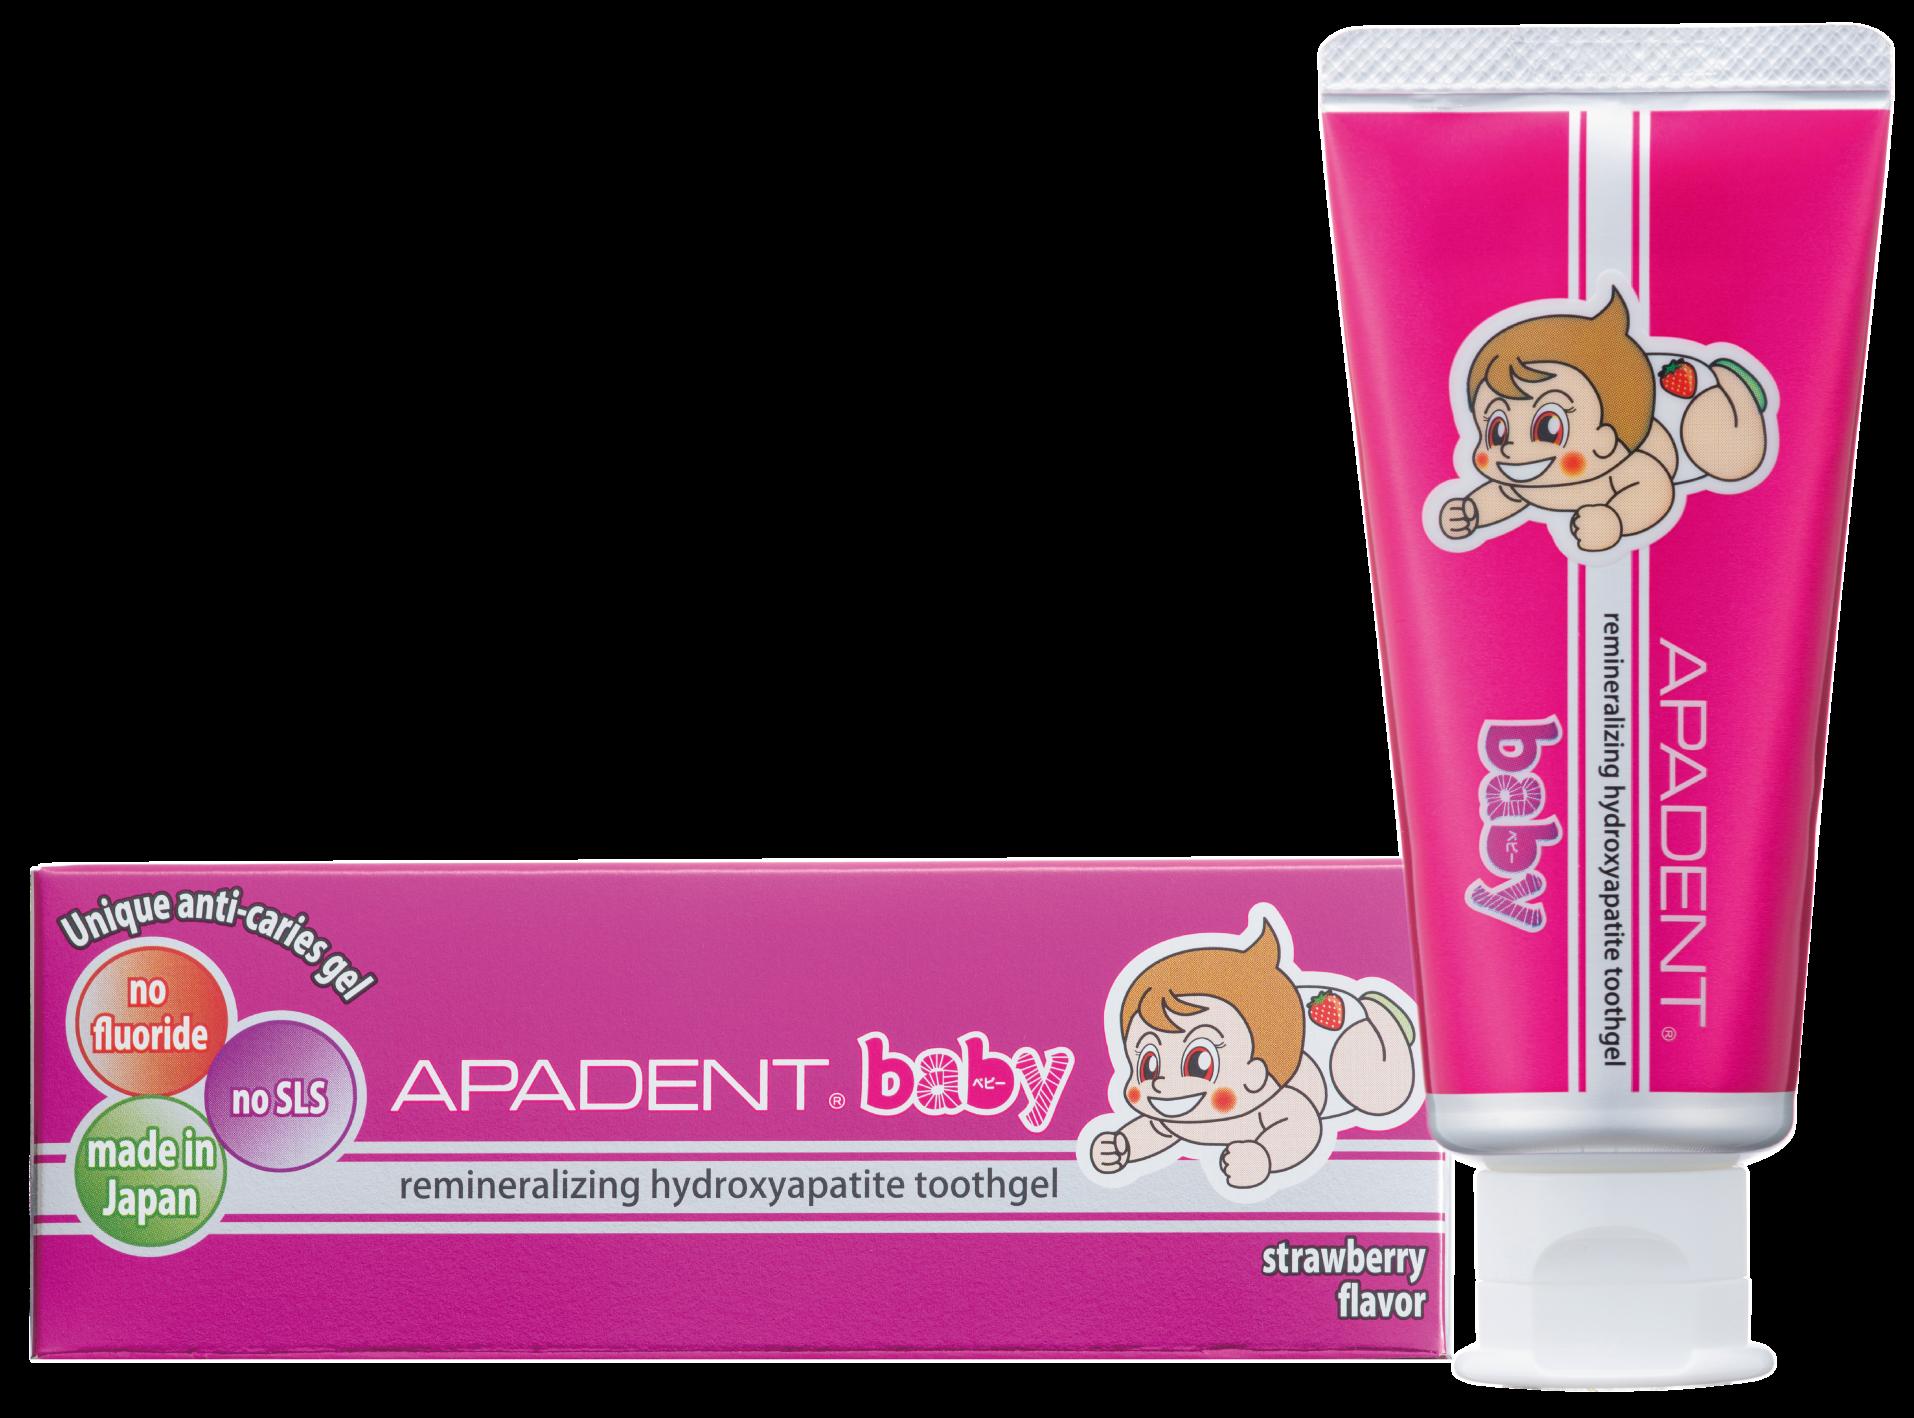 APADENT® BABY